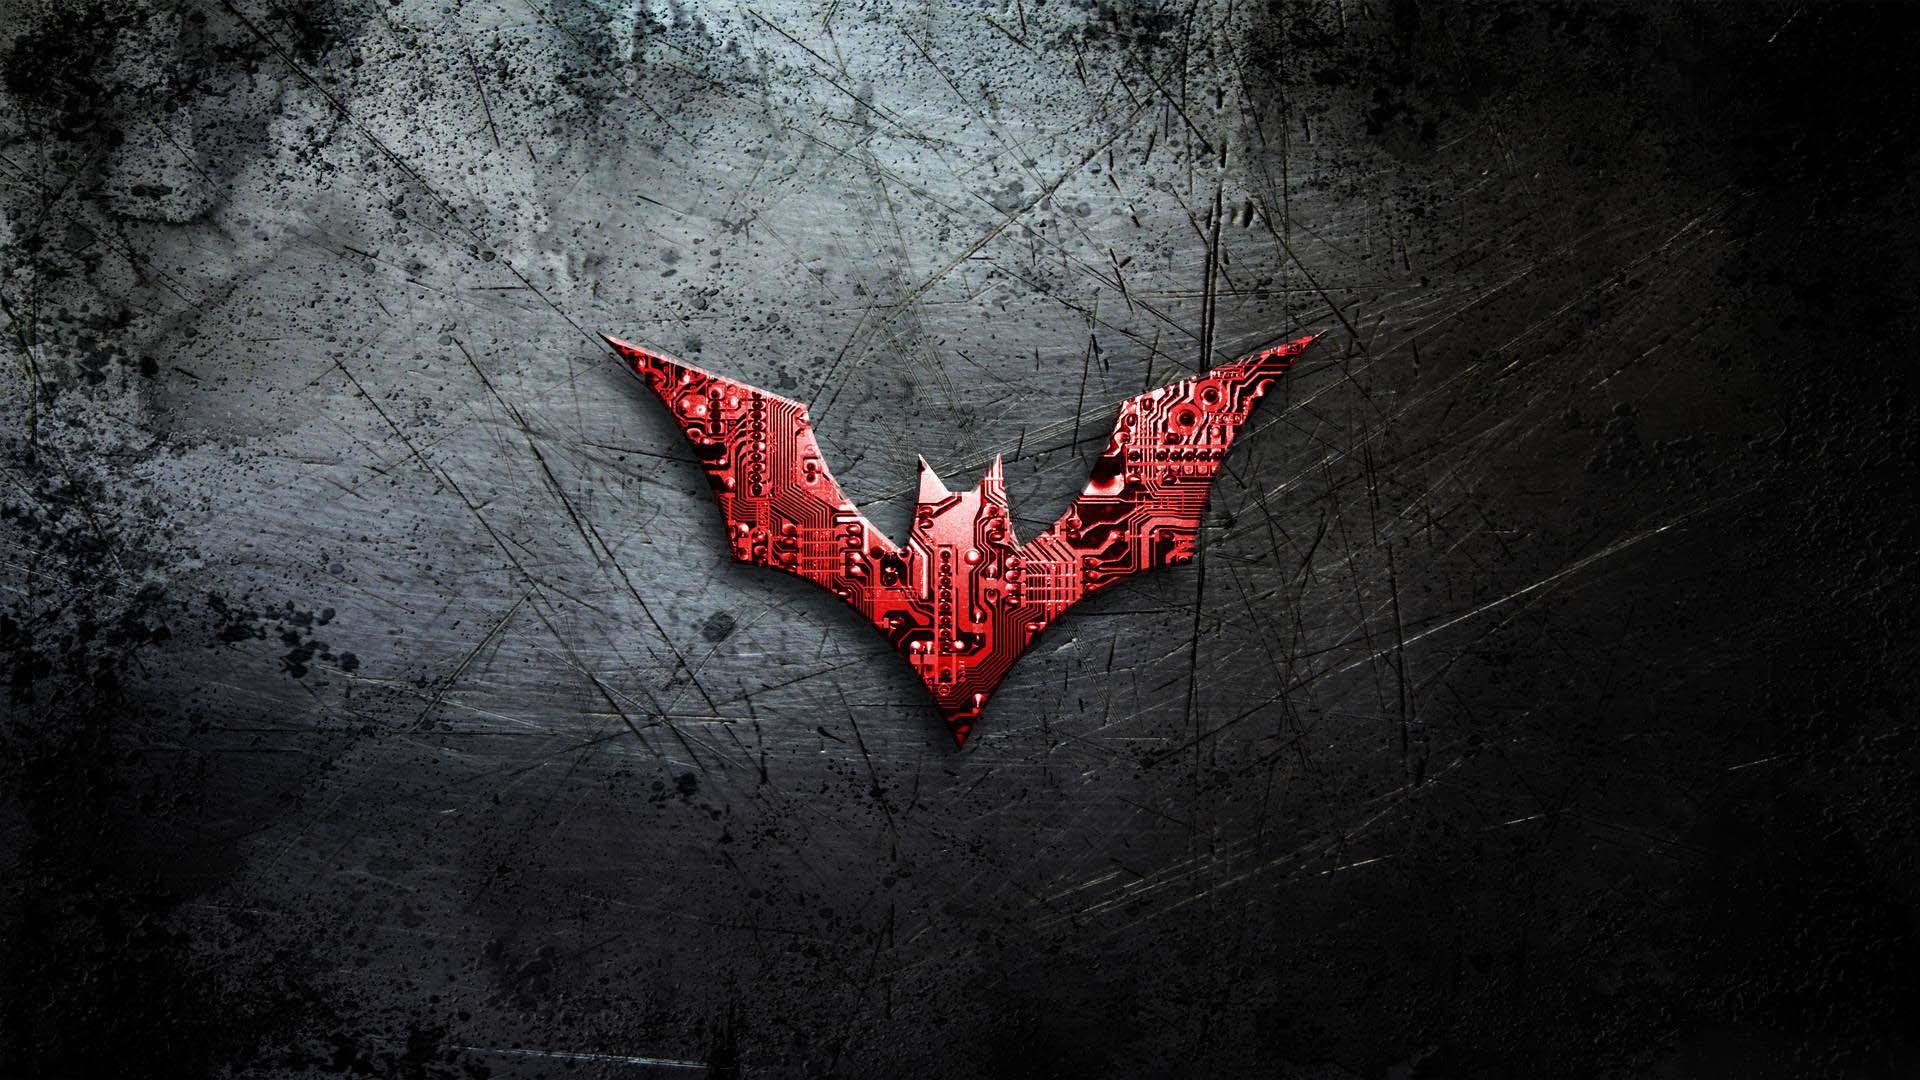 Dark Knight Logo Wallpaper Hd Posted By Zoey Mercado